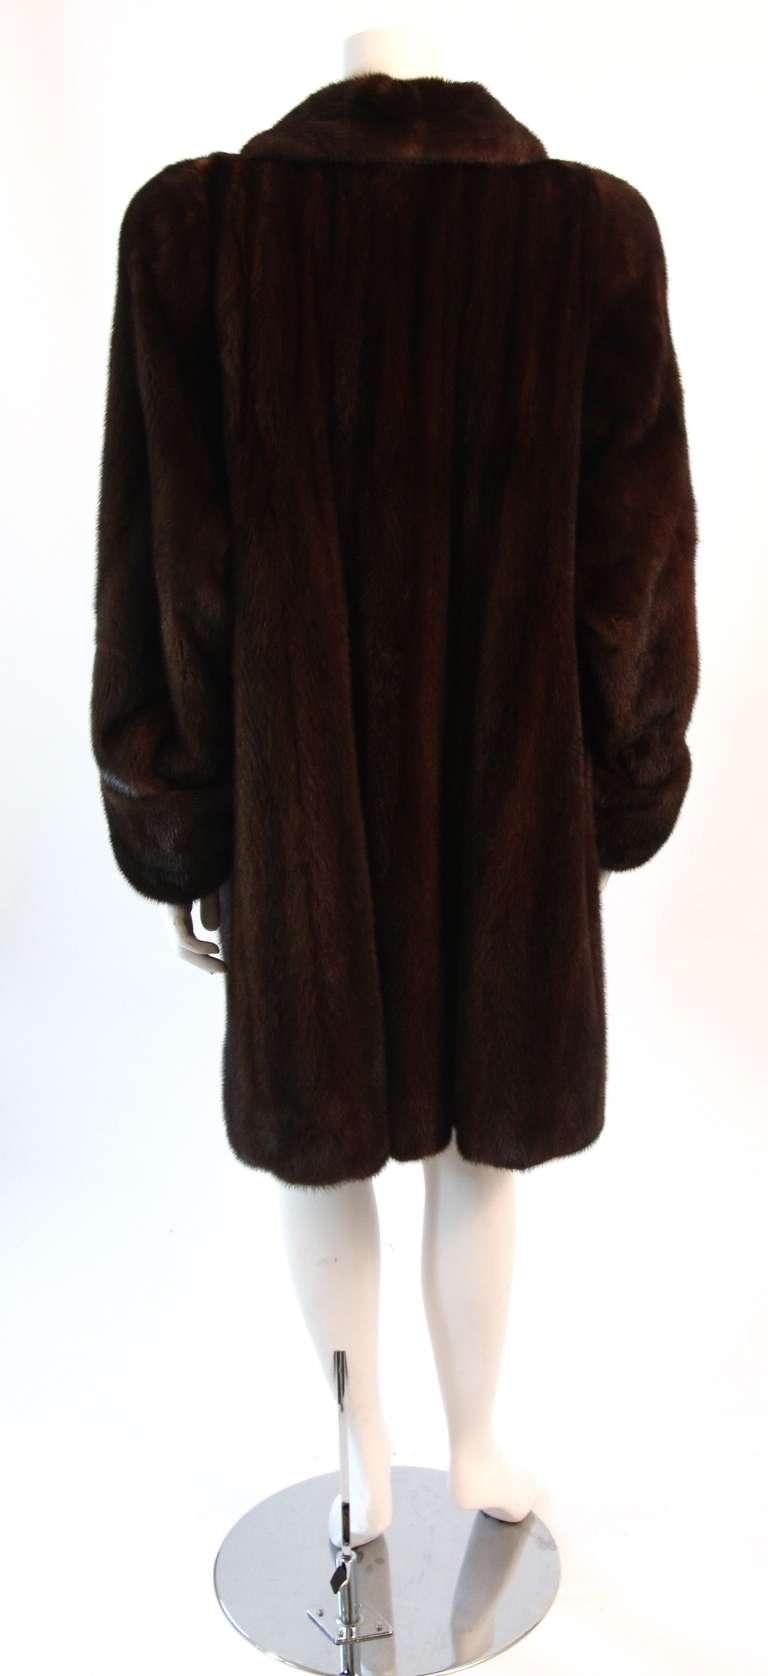 Luscious Somper Fur Couture Shawl Collar Mink 3/4 length Coat sz 6-8 6